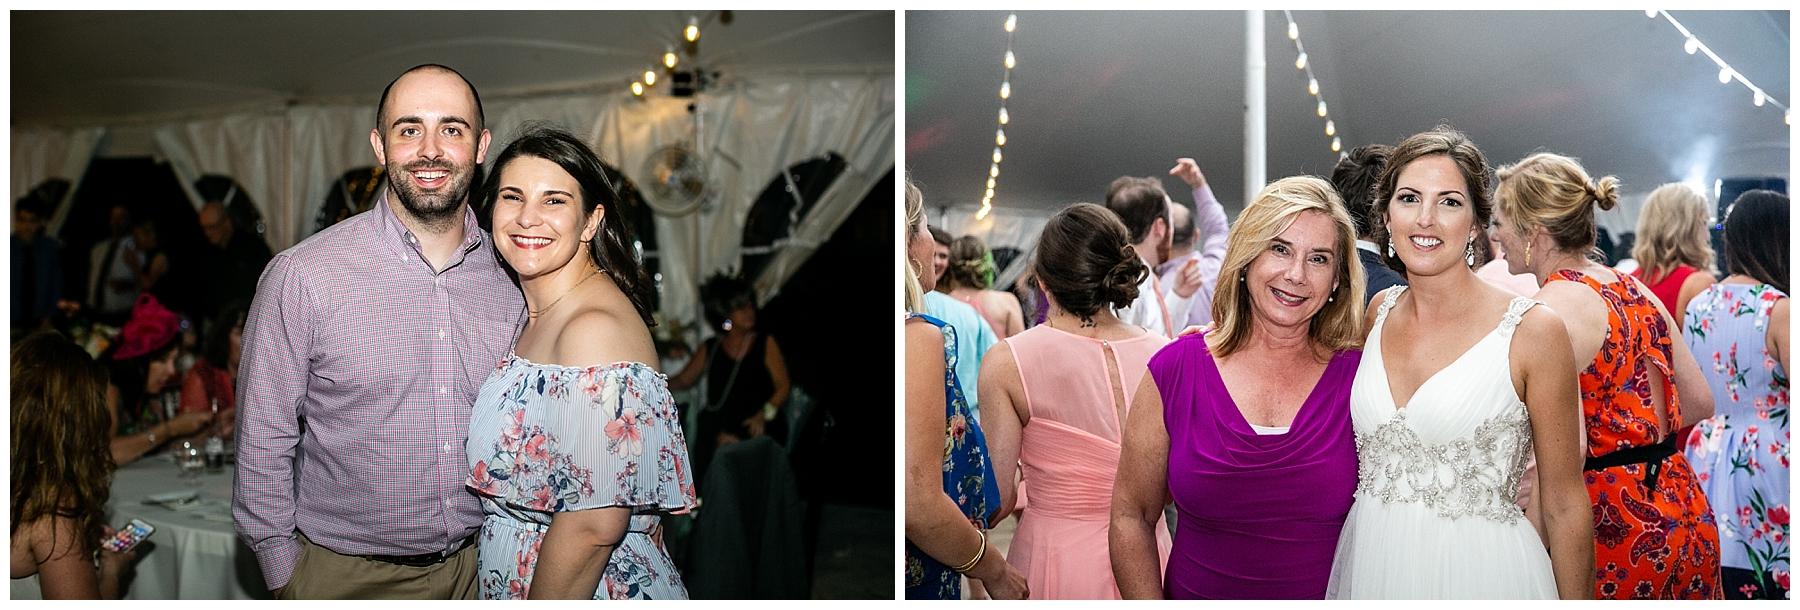 Chelsea Phil Bohemia River Overlook Wedding Living Radiant Photography photos_0205.jpg